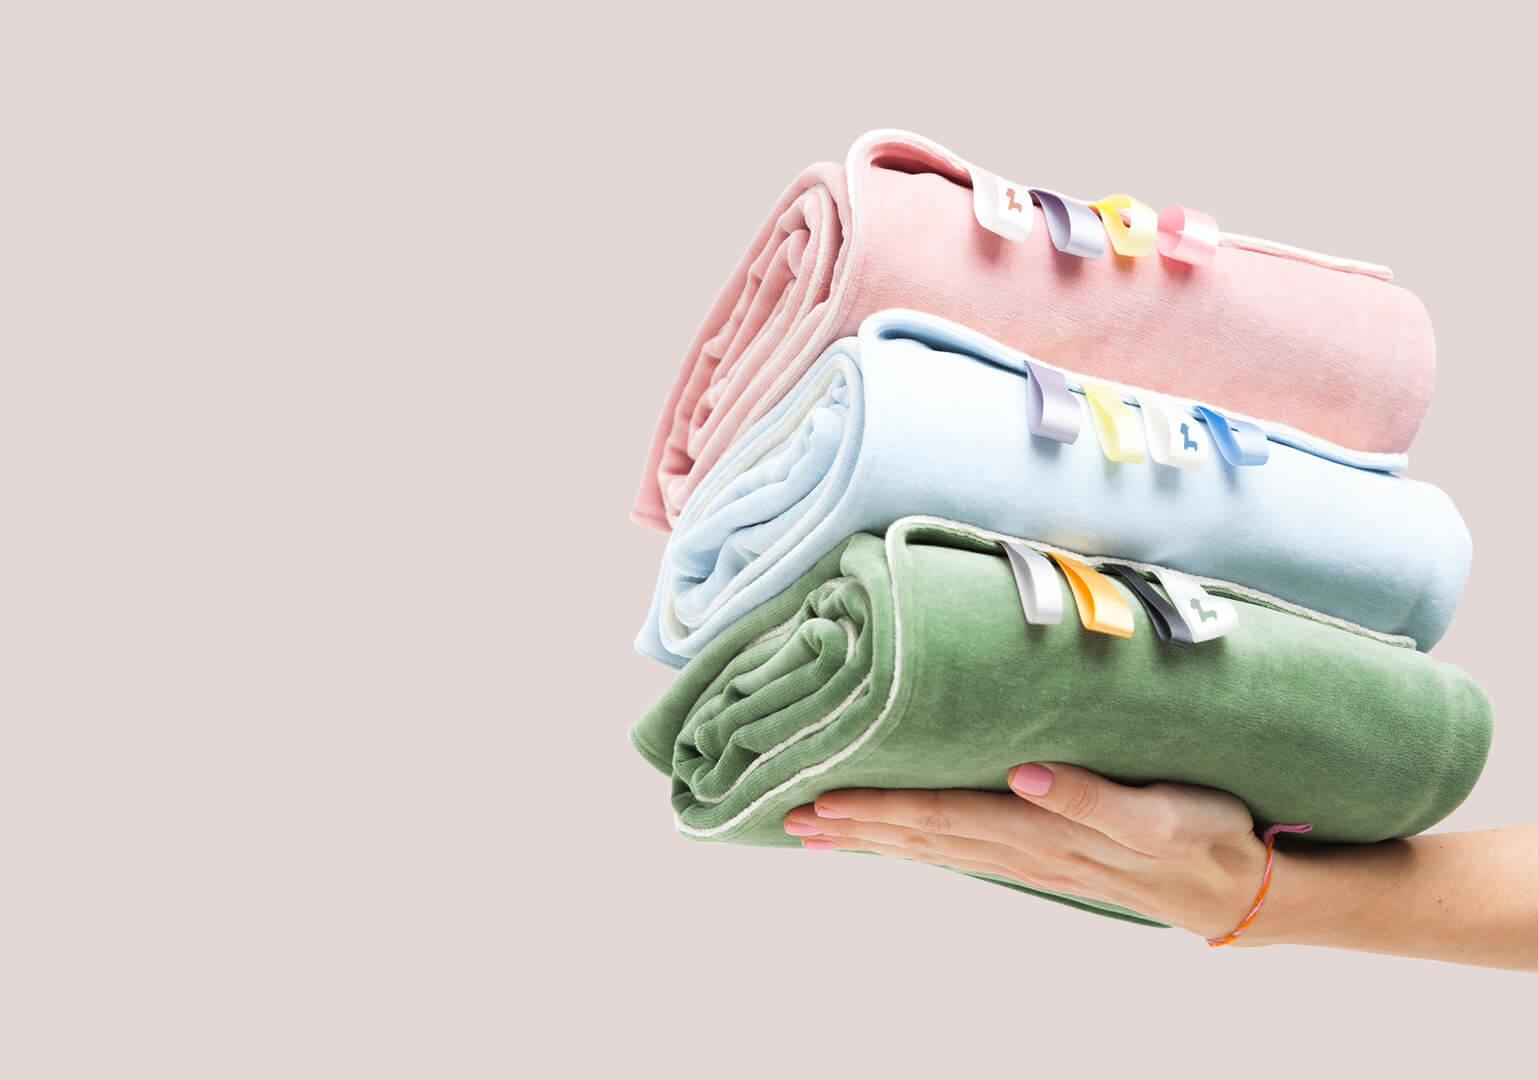 Blankets - Organic handmade gifts